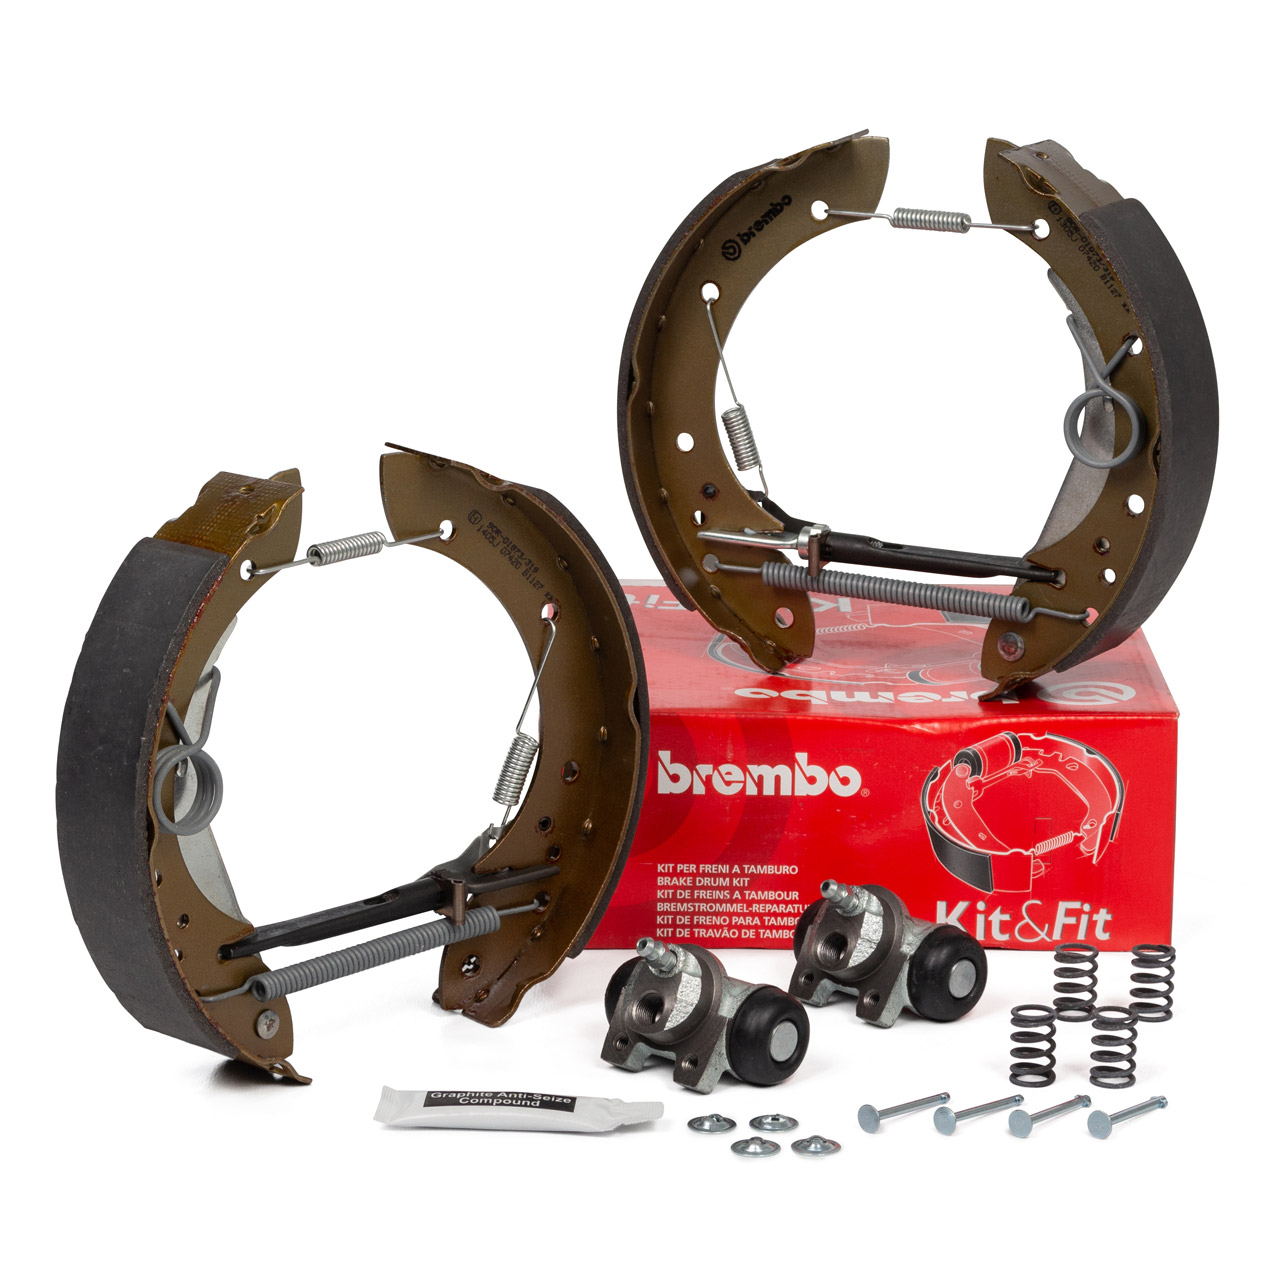 BREMBO KIT & FIT Bremsbacken + Radbremszylinder Satz CITROEN PEUGEOT hinten